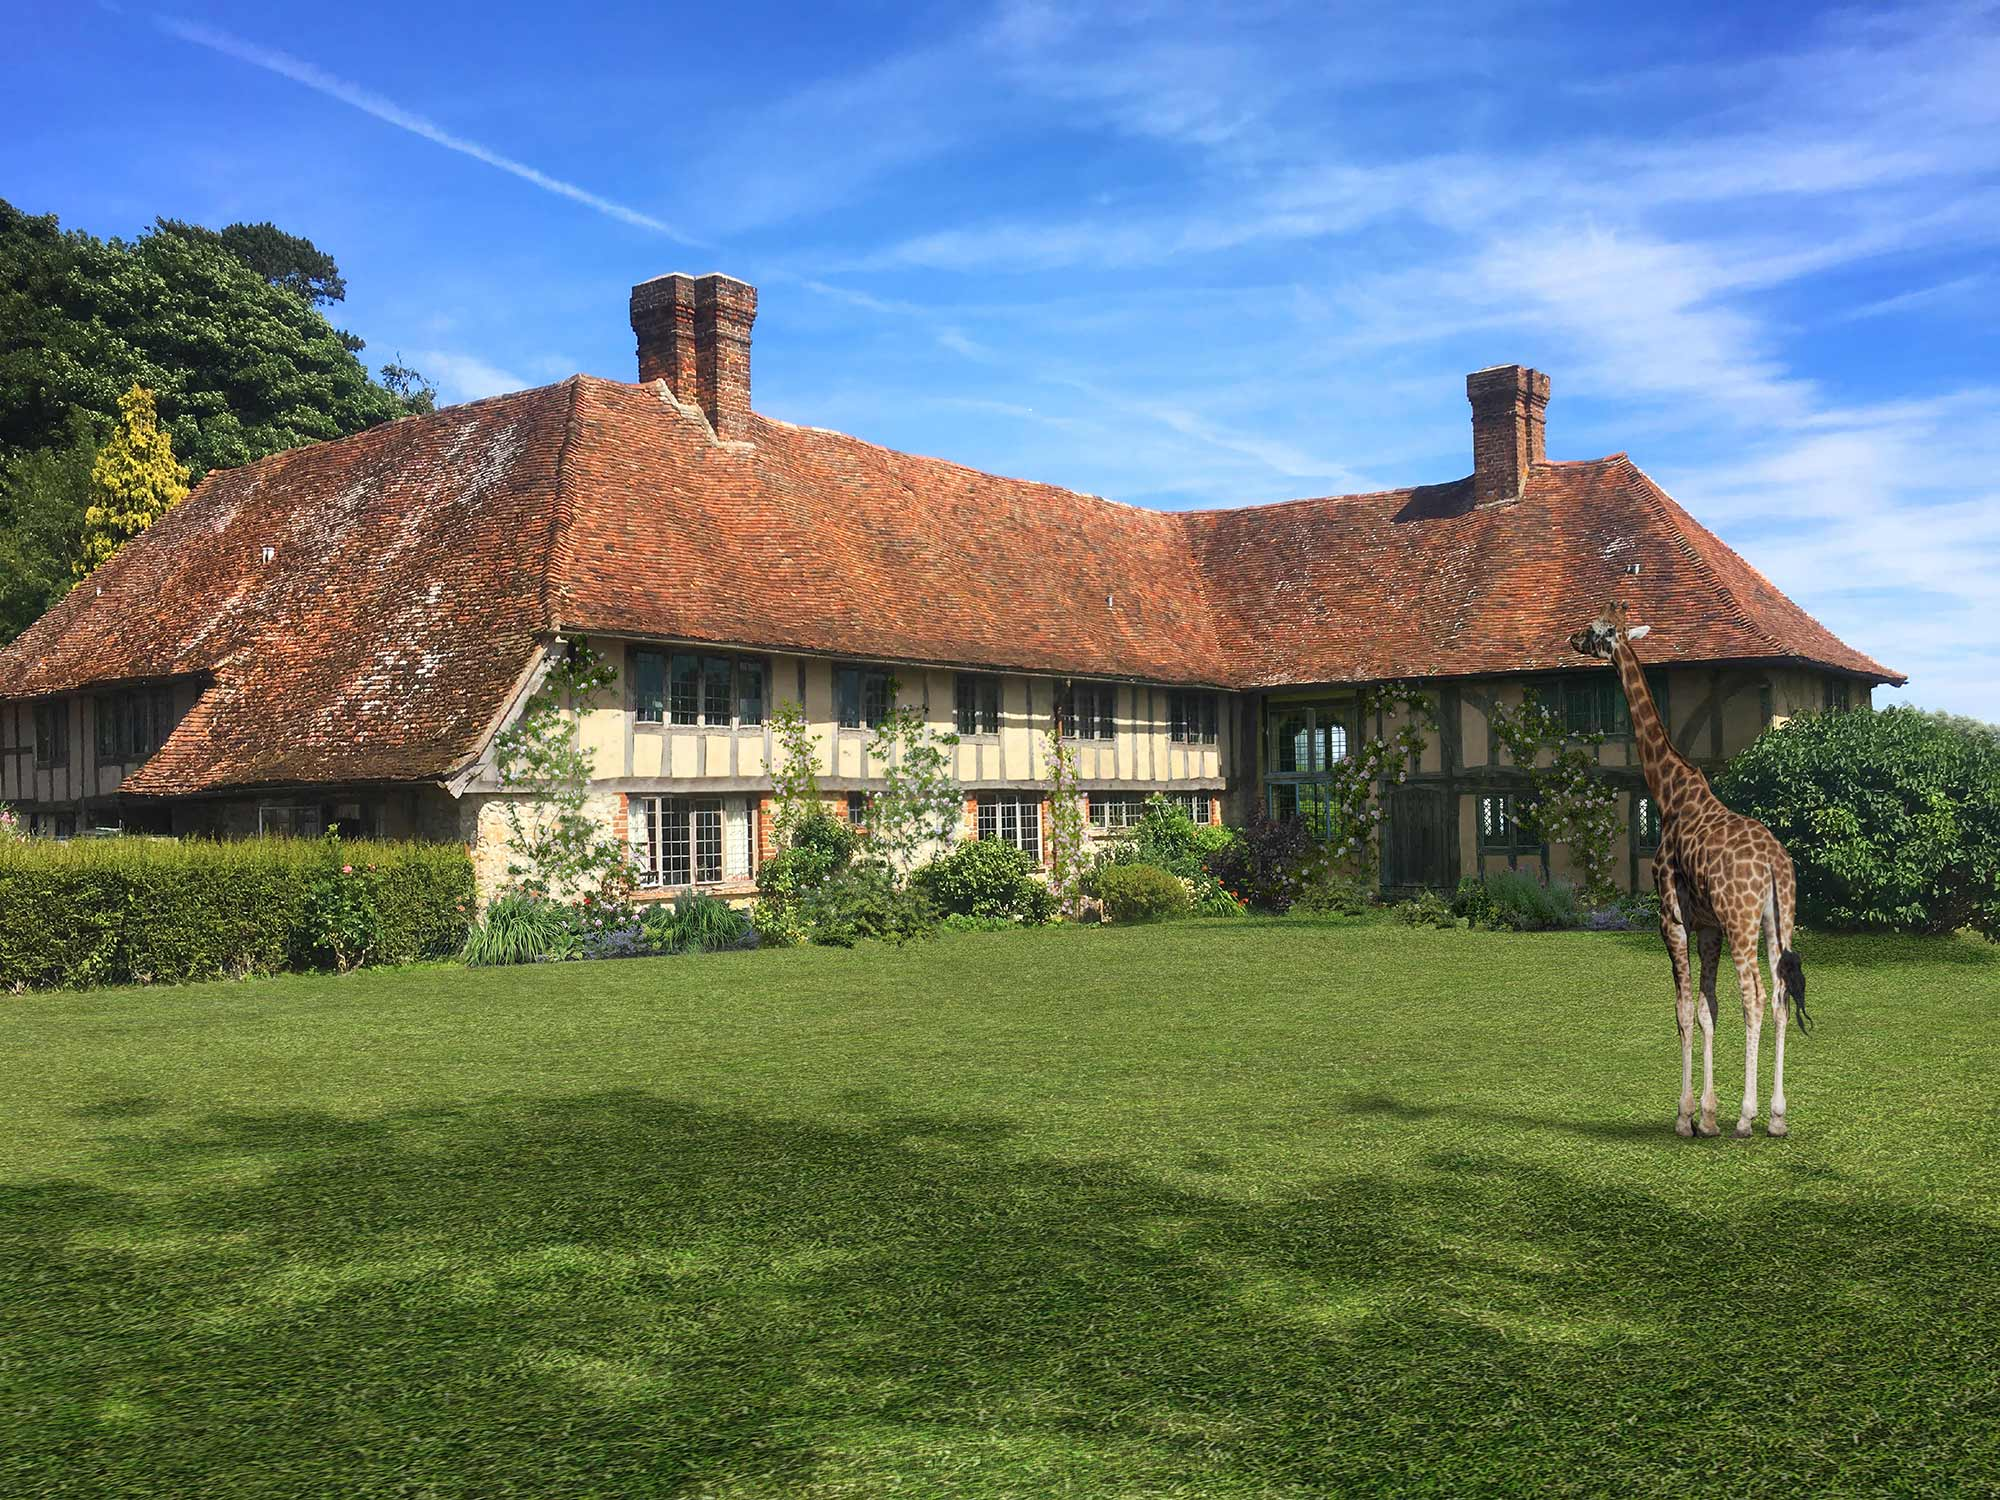 Giraffe Hall